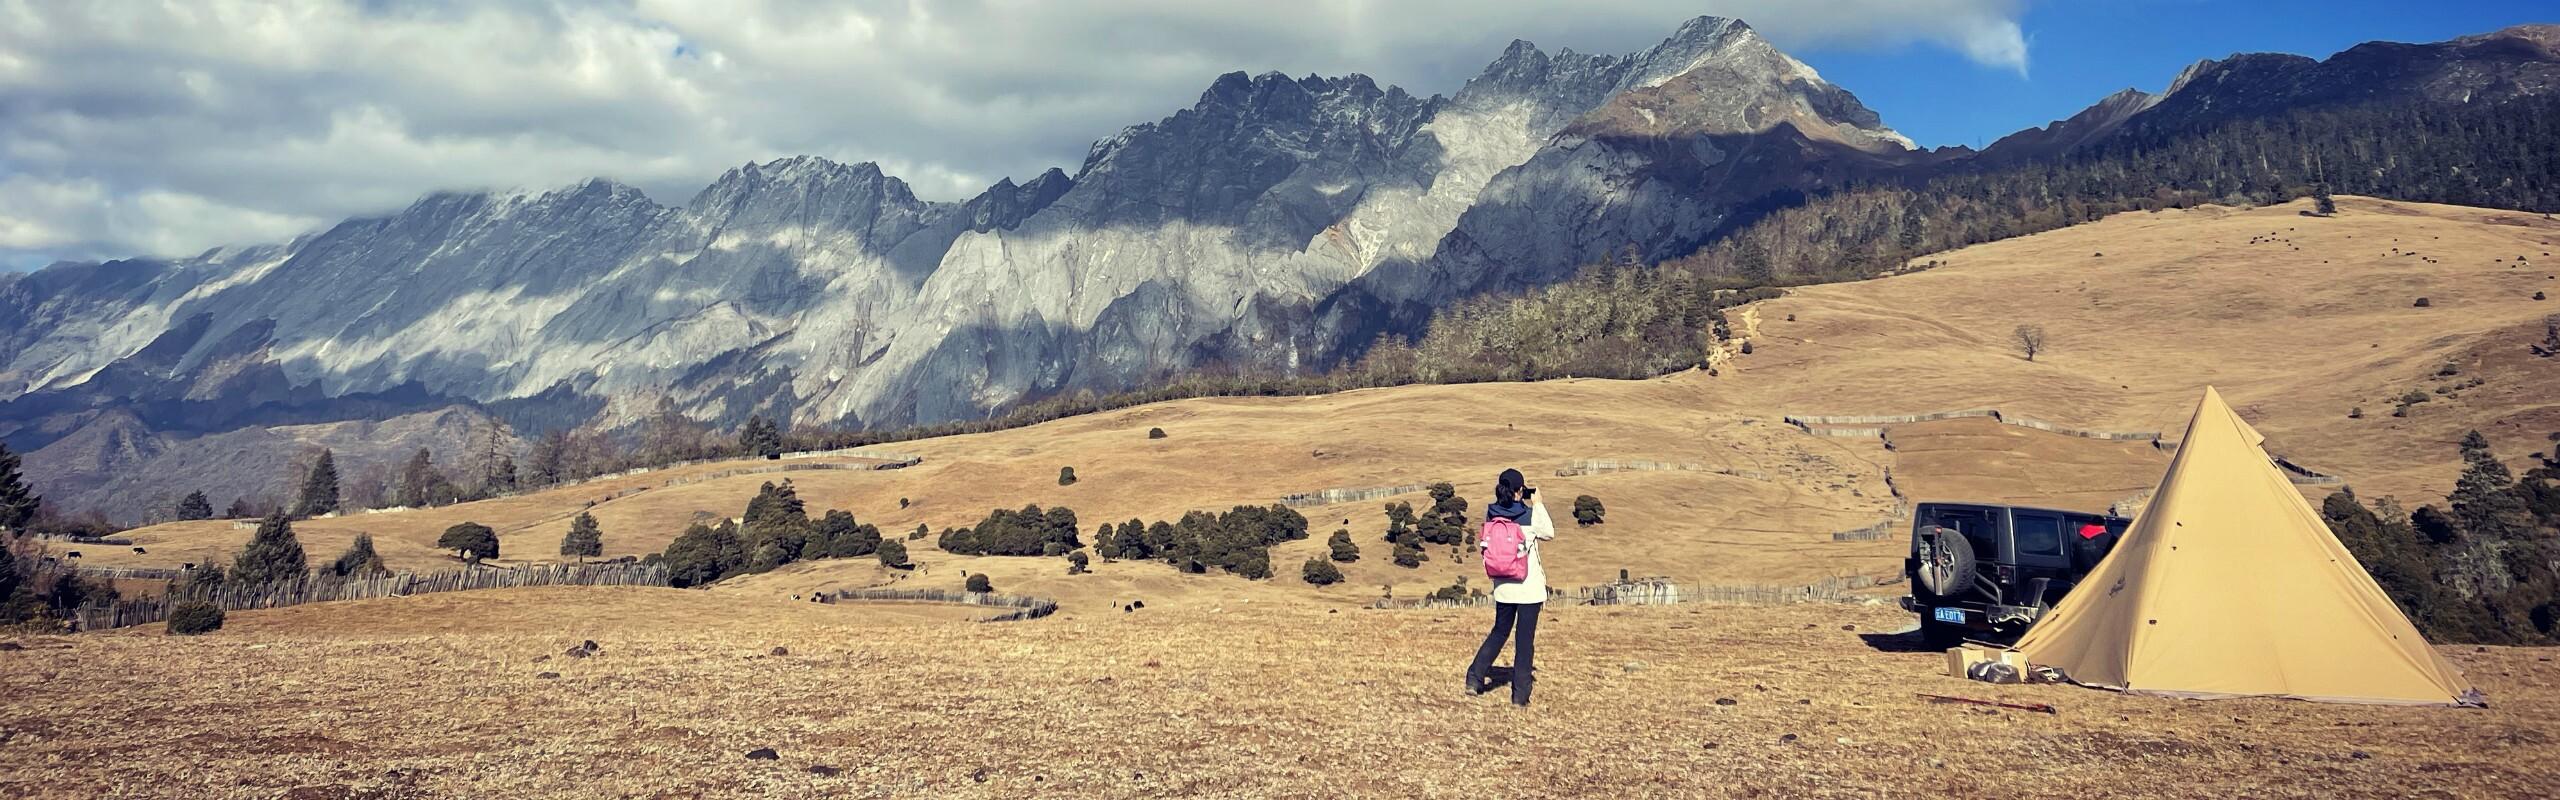 6-Day Lijiang to Shangri-La Adventure Tour